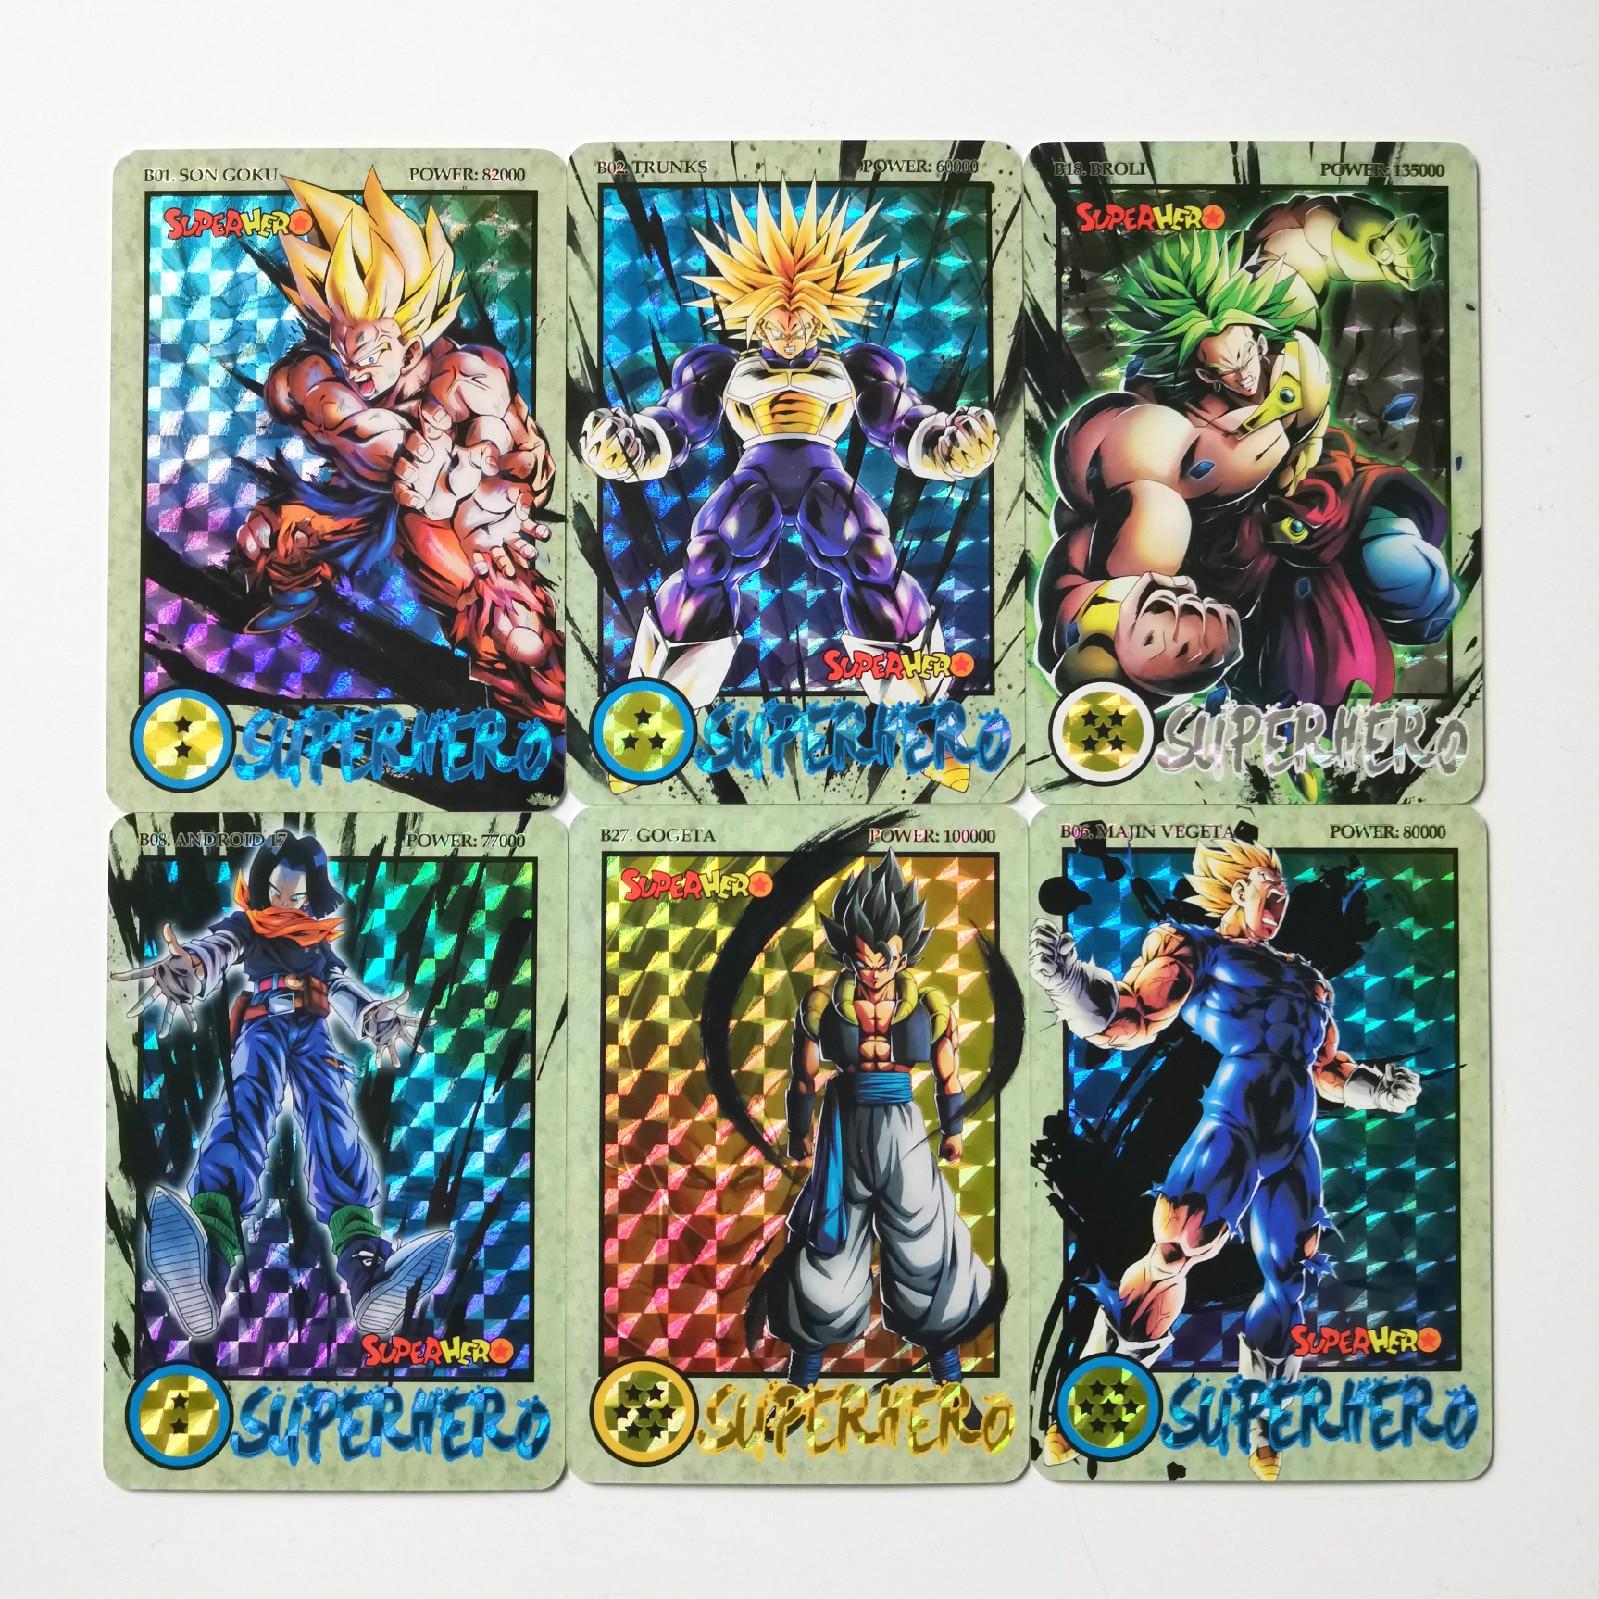 27pcs/set Super Dragon Ball Z Ink Relief Heroes Battle Card Ultra Instinct Goku Vegeta Game Collection Cards